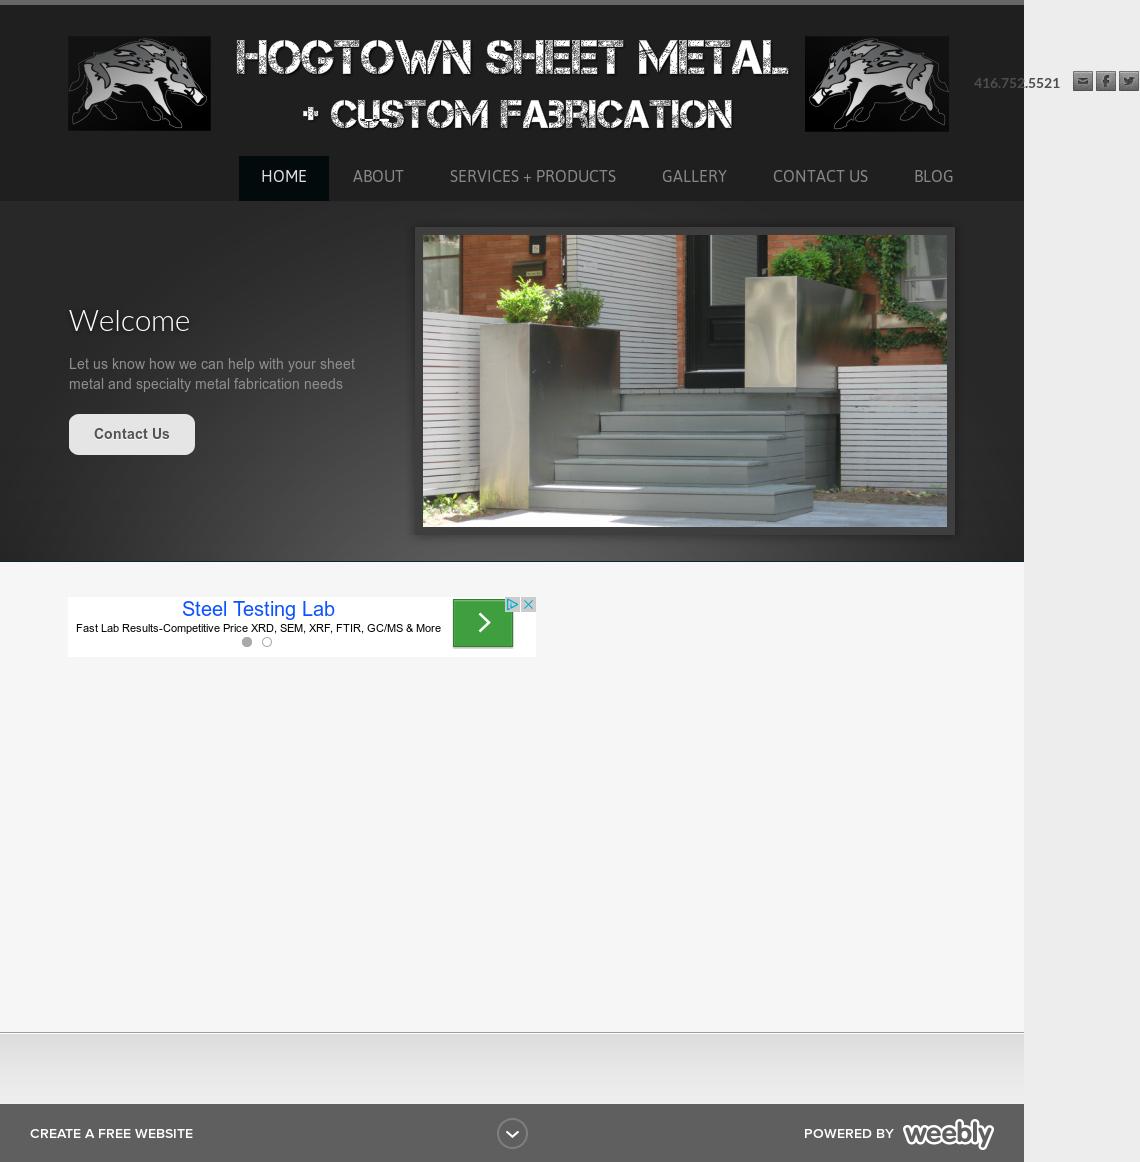 Hogtown Sheet Metal + Custom Fabrication Competitors, Revenue and